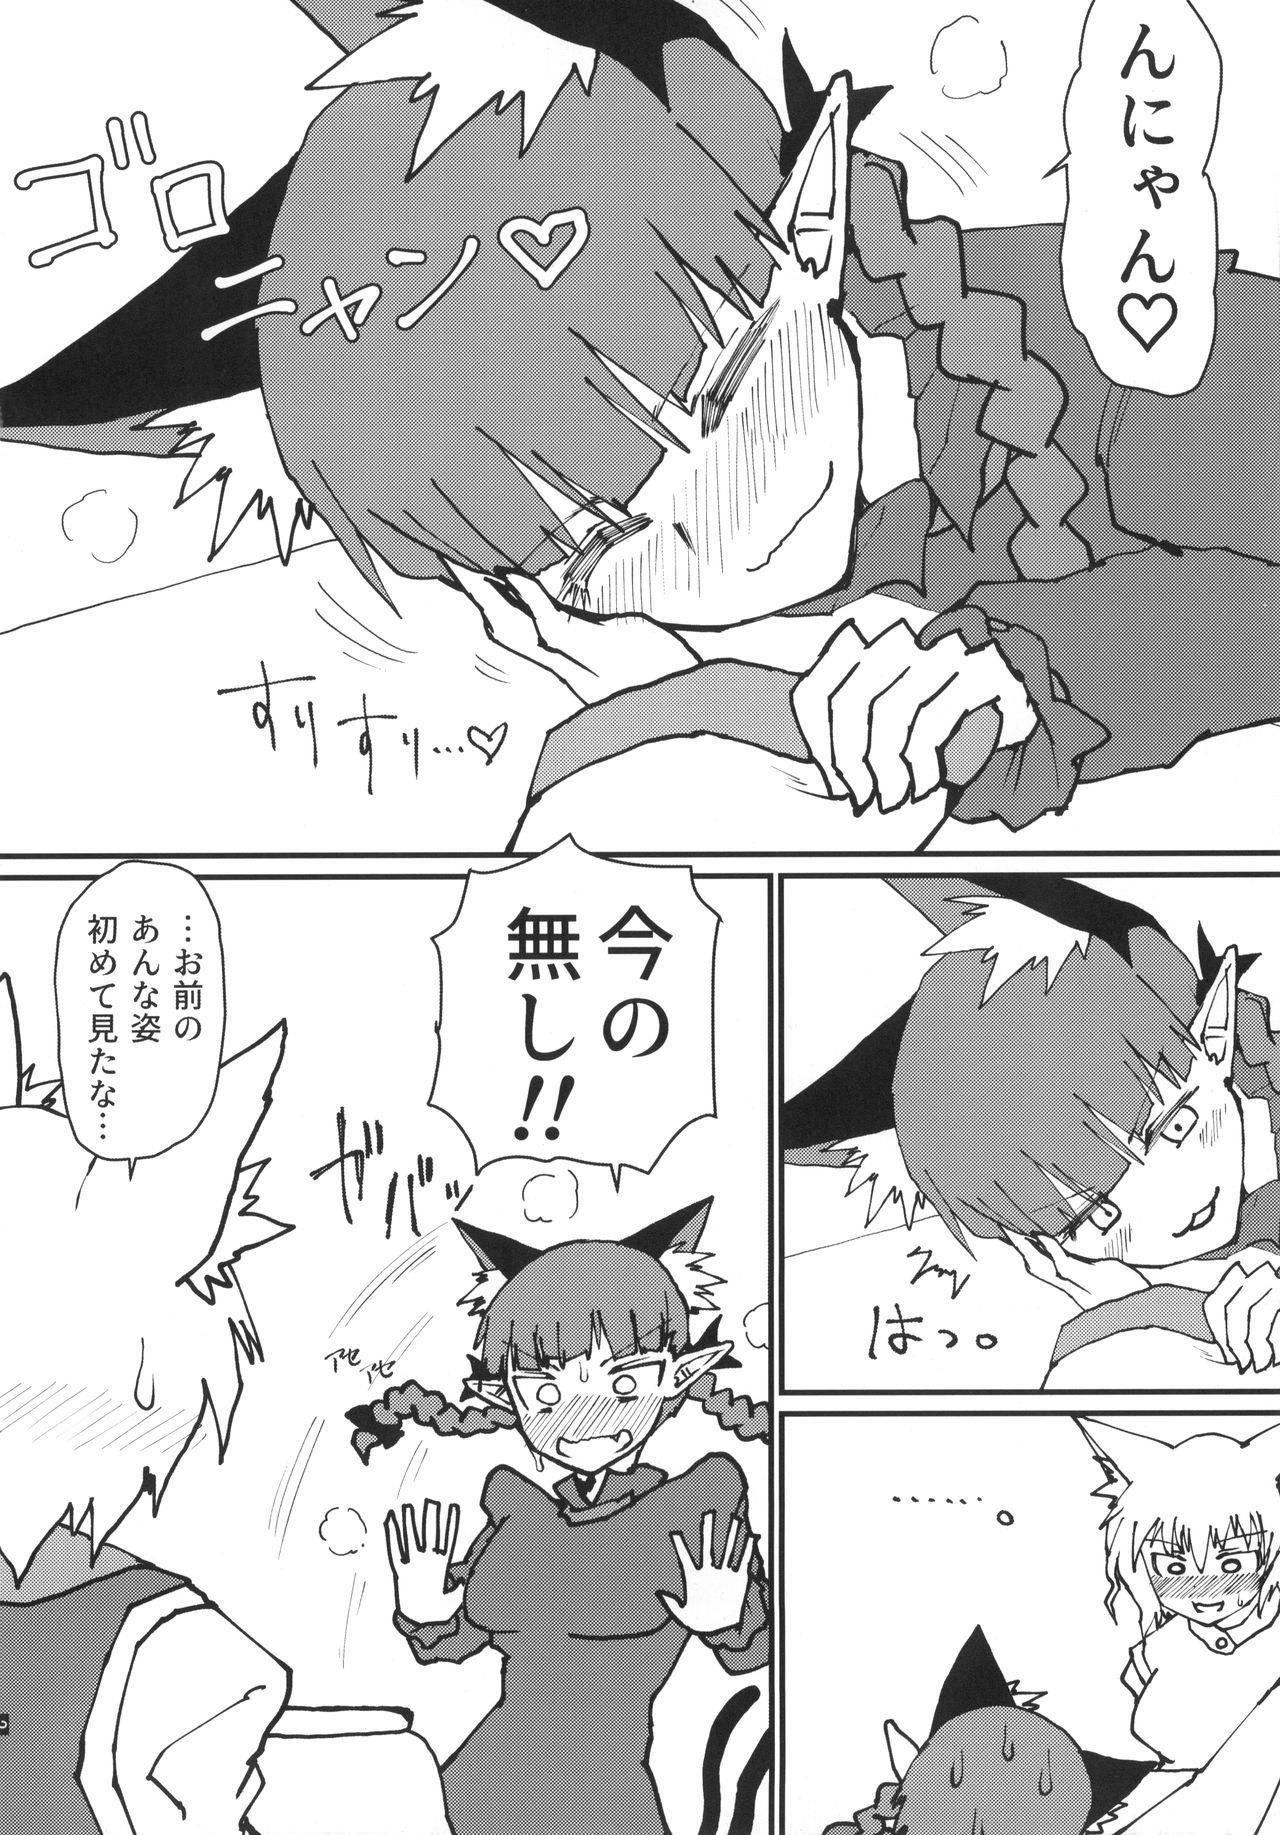 Orin-chan o Tappuri Amae Sasete Takusan Shasei Sasete Ageru Hon. 2